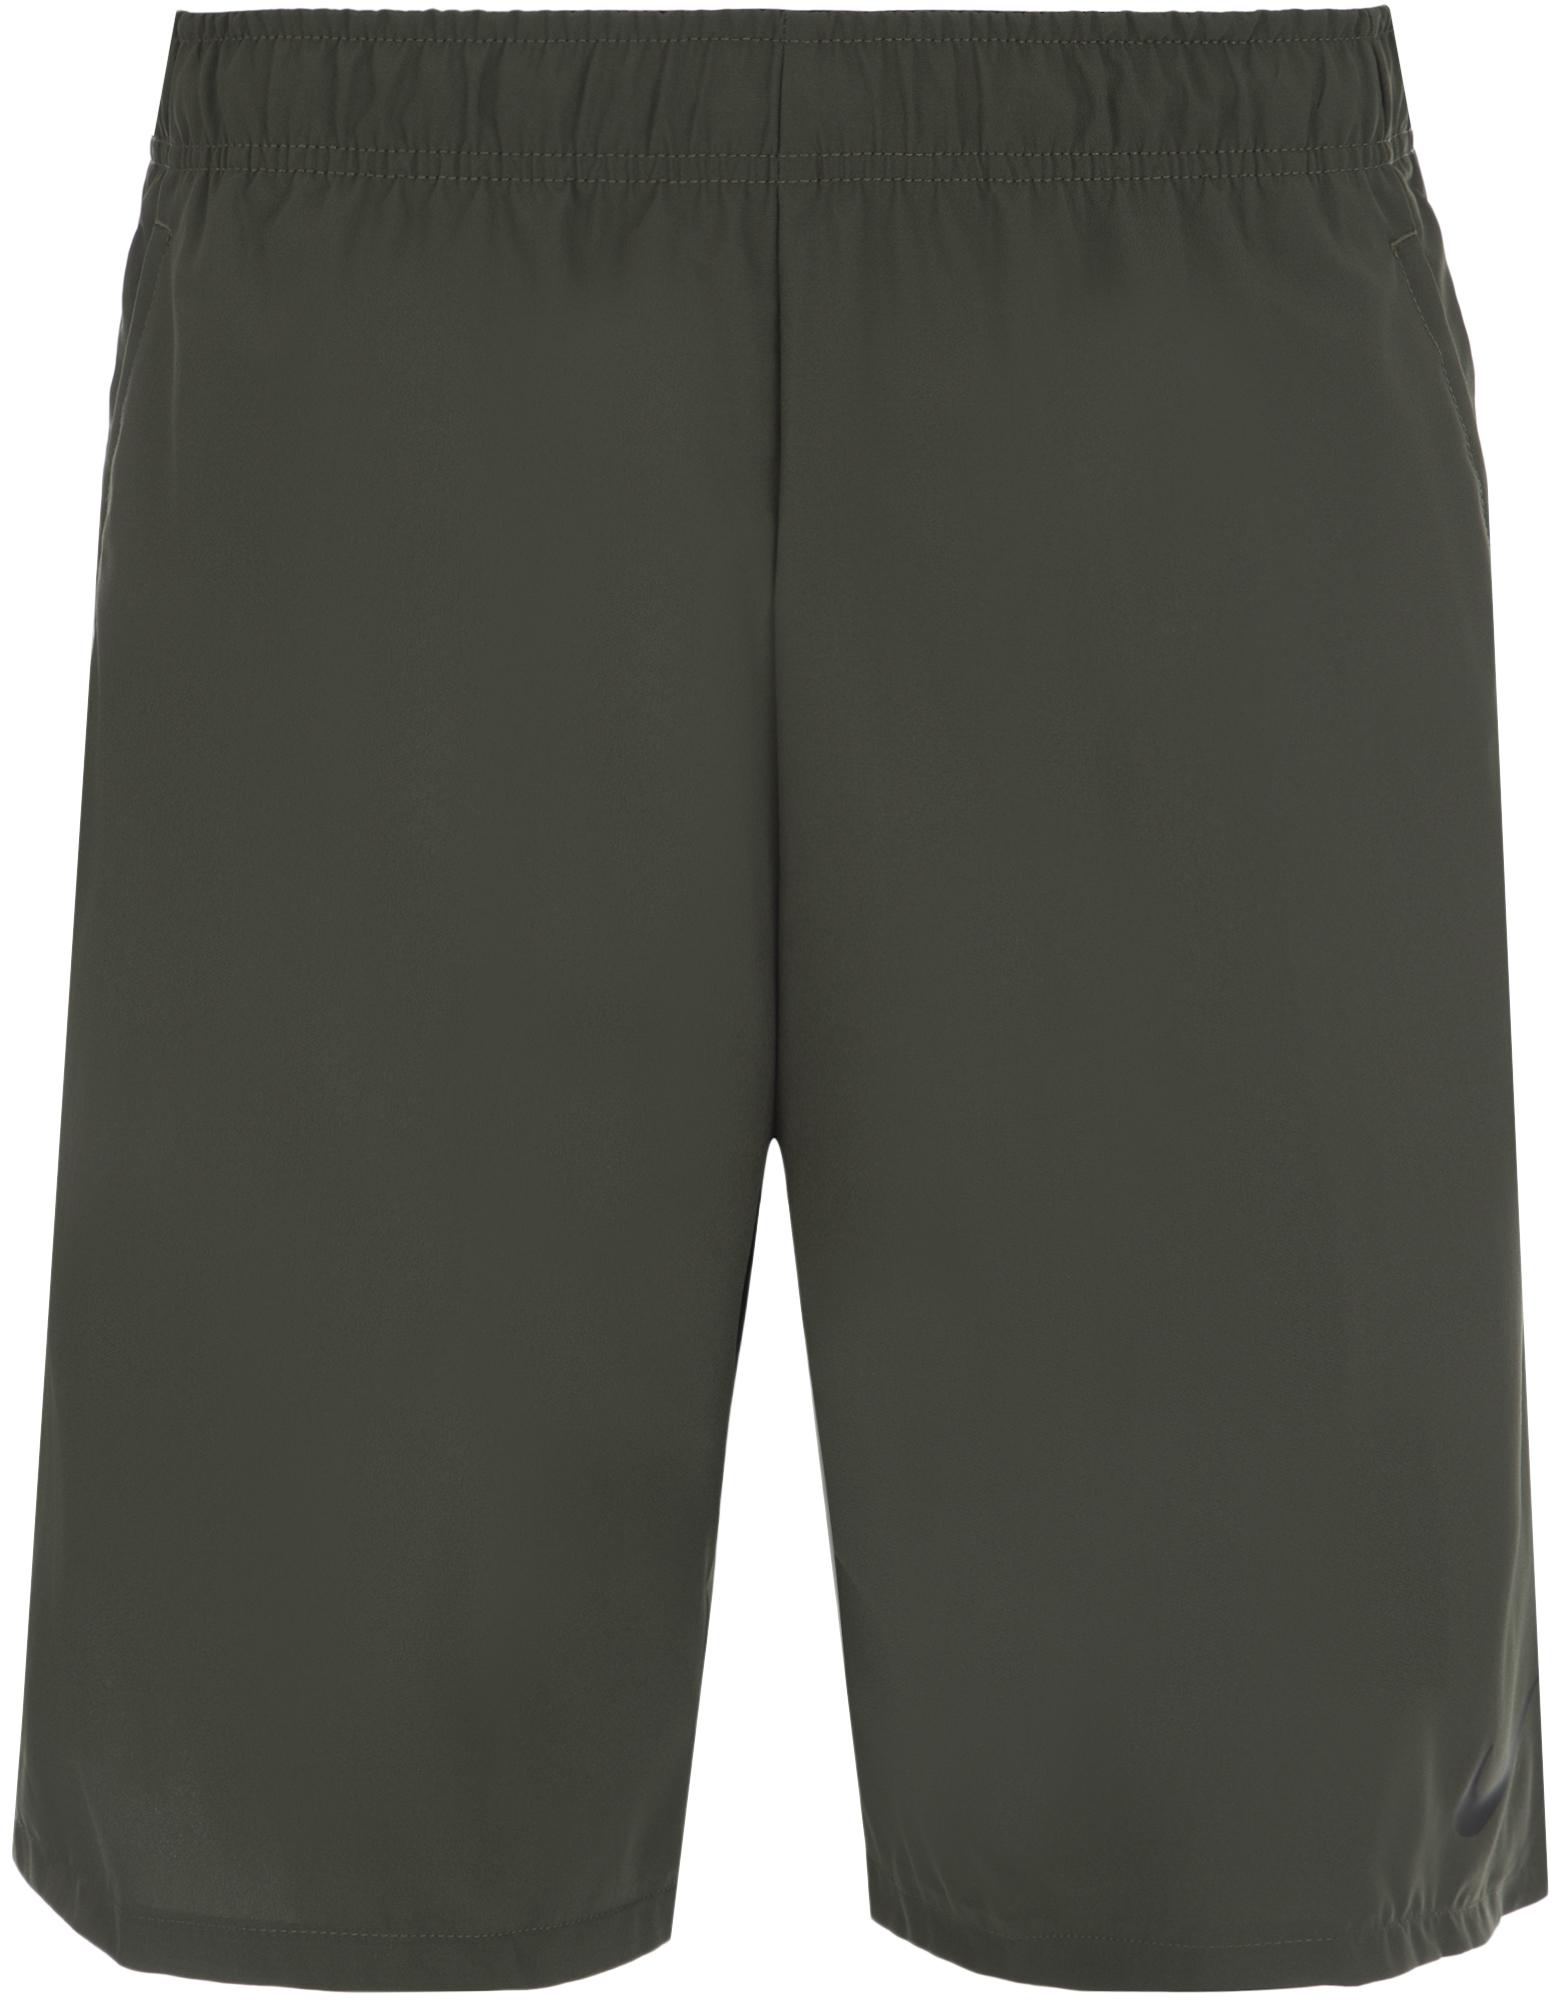 Nike Шорты мужские Nike Flex, размер 54-56 цены онлайн